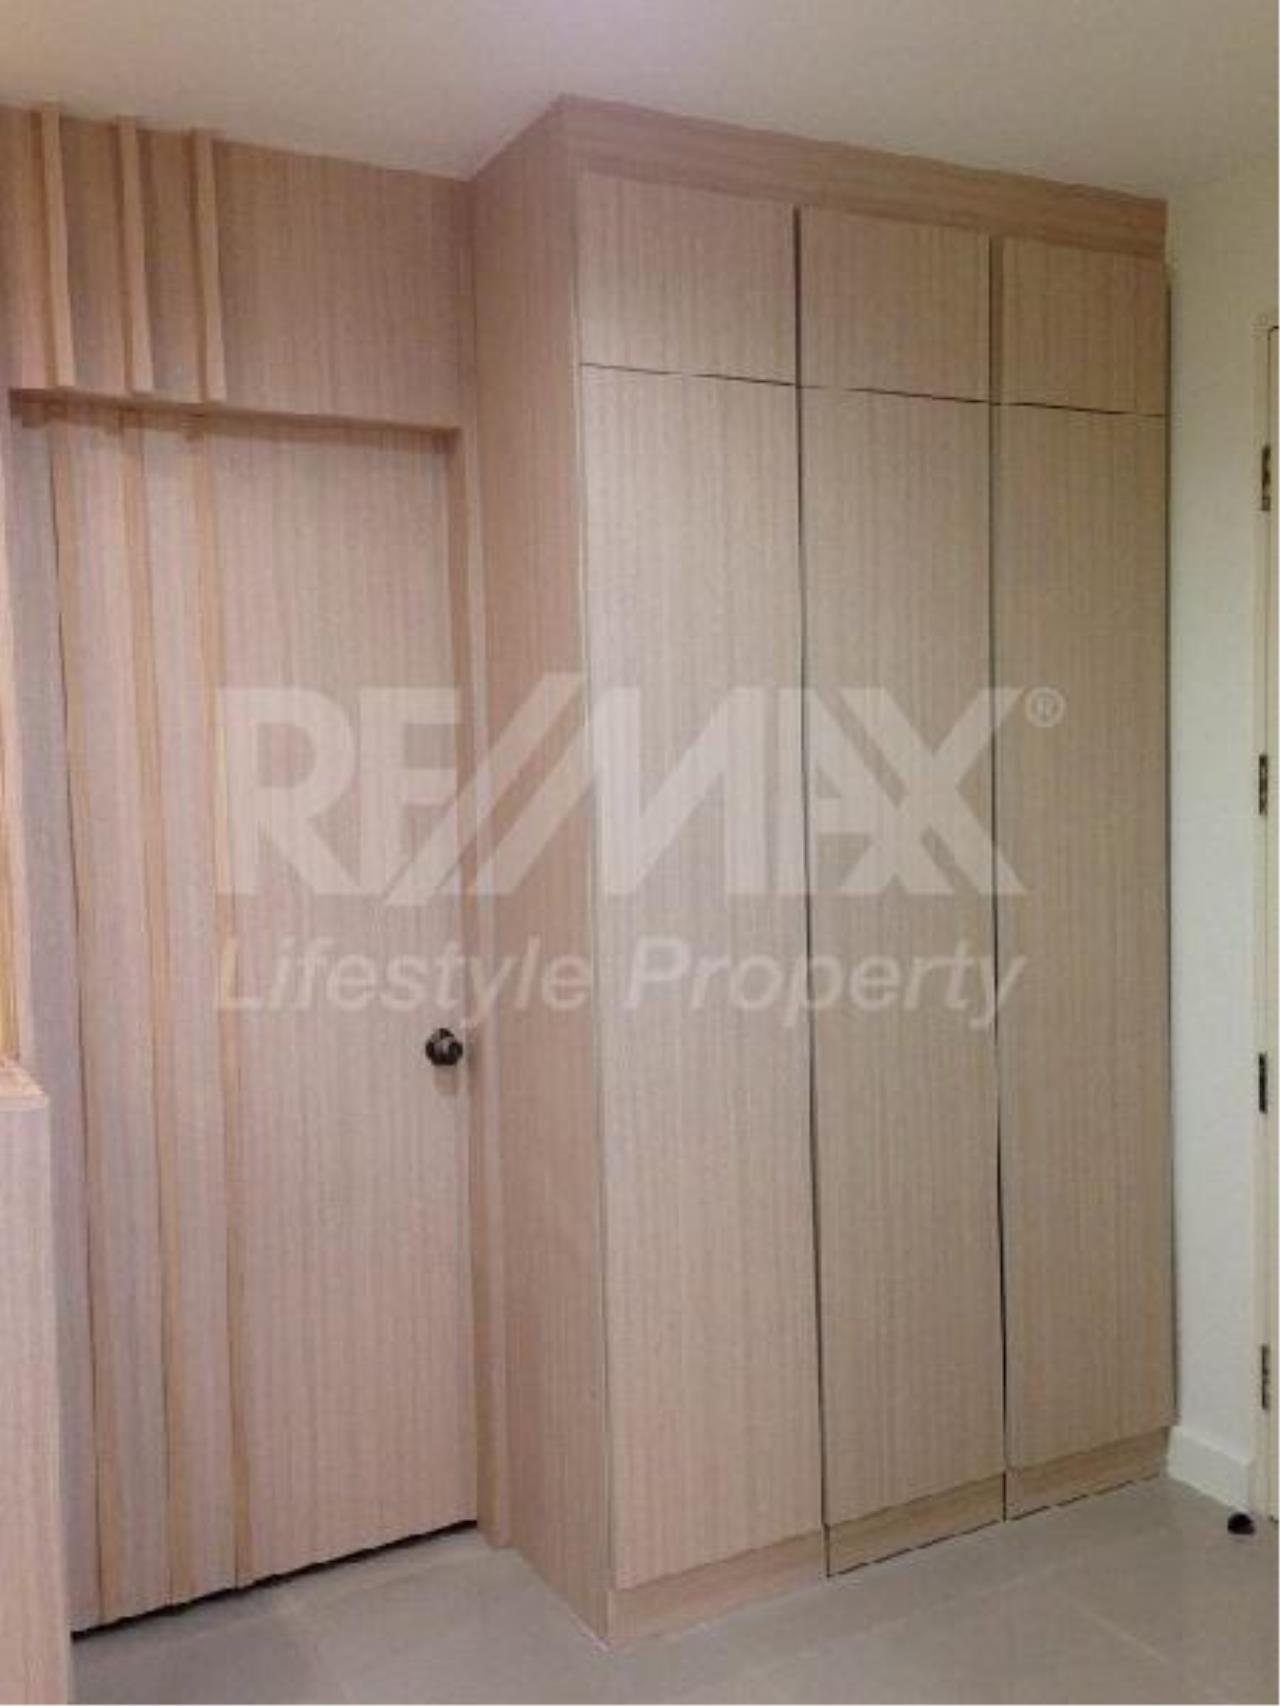 RE/MAX LifeStyle Property Agency's Serene Place Sukhumvit 24 7